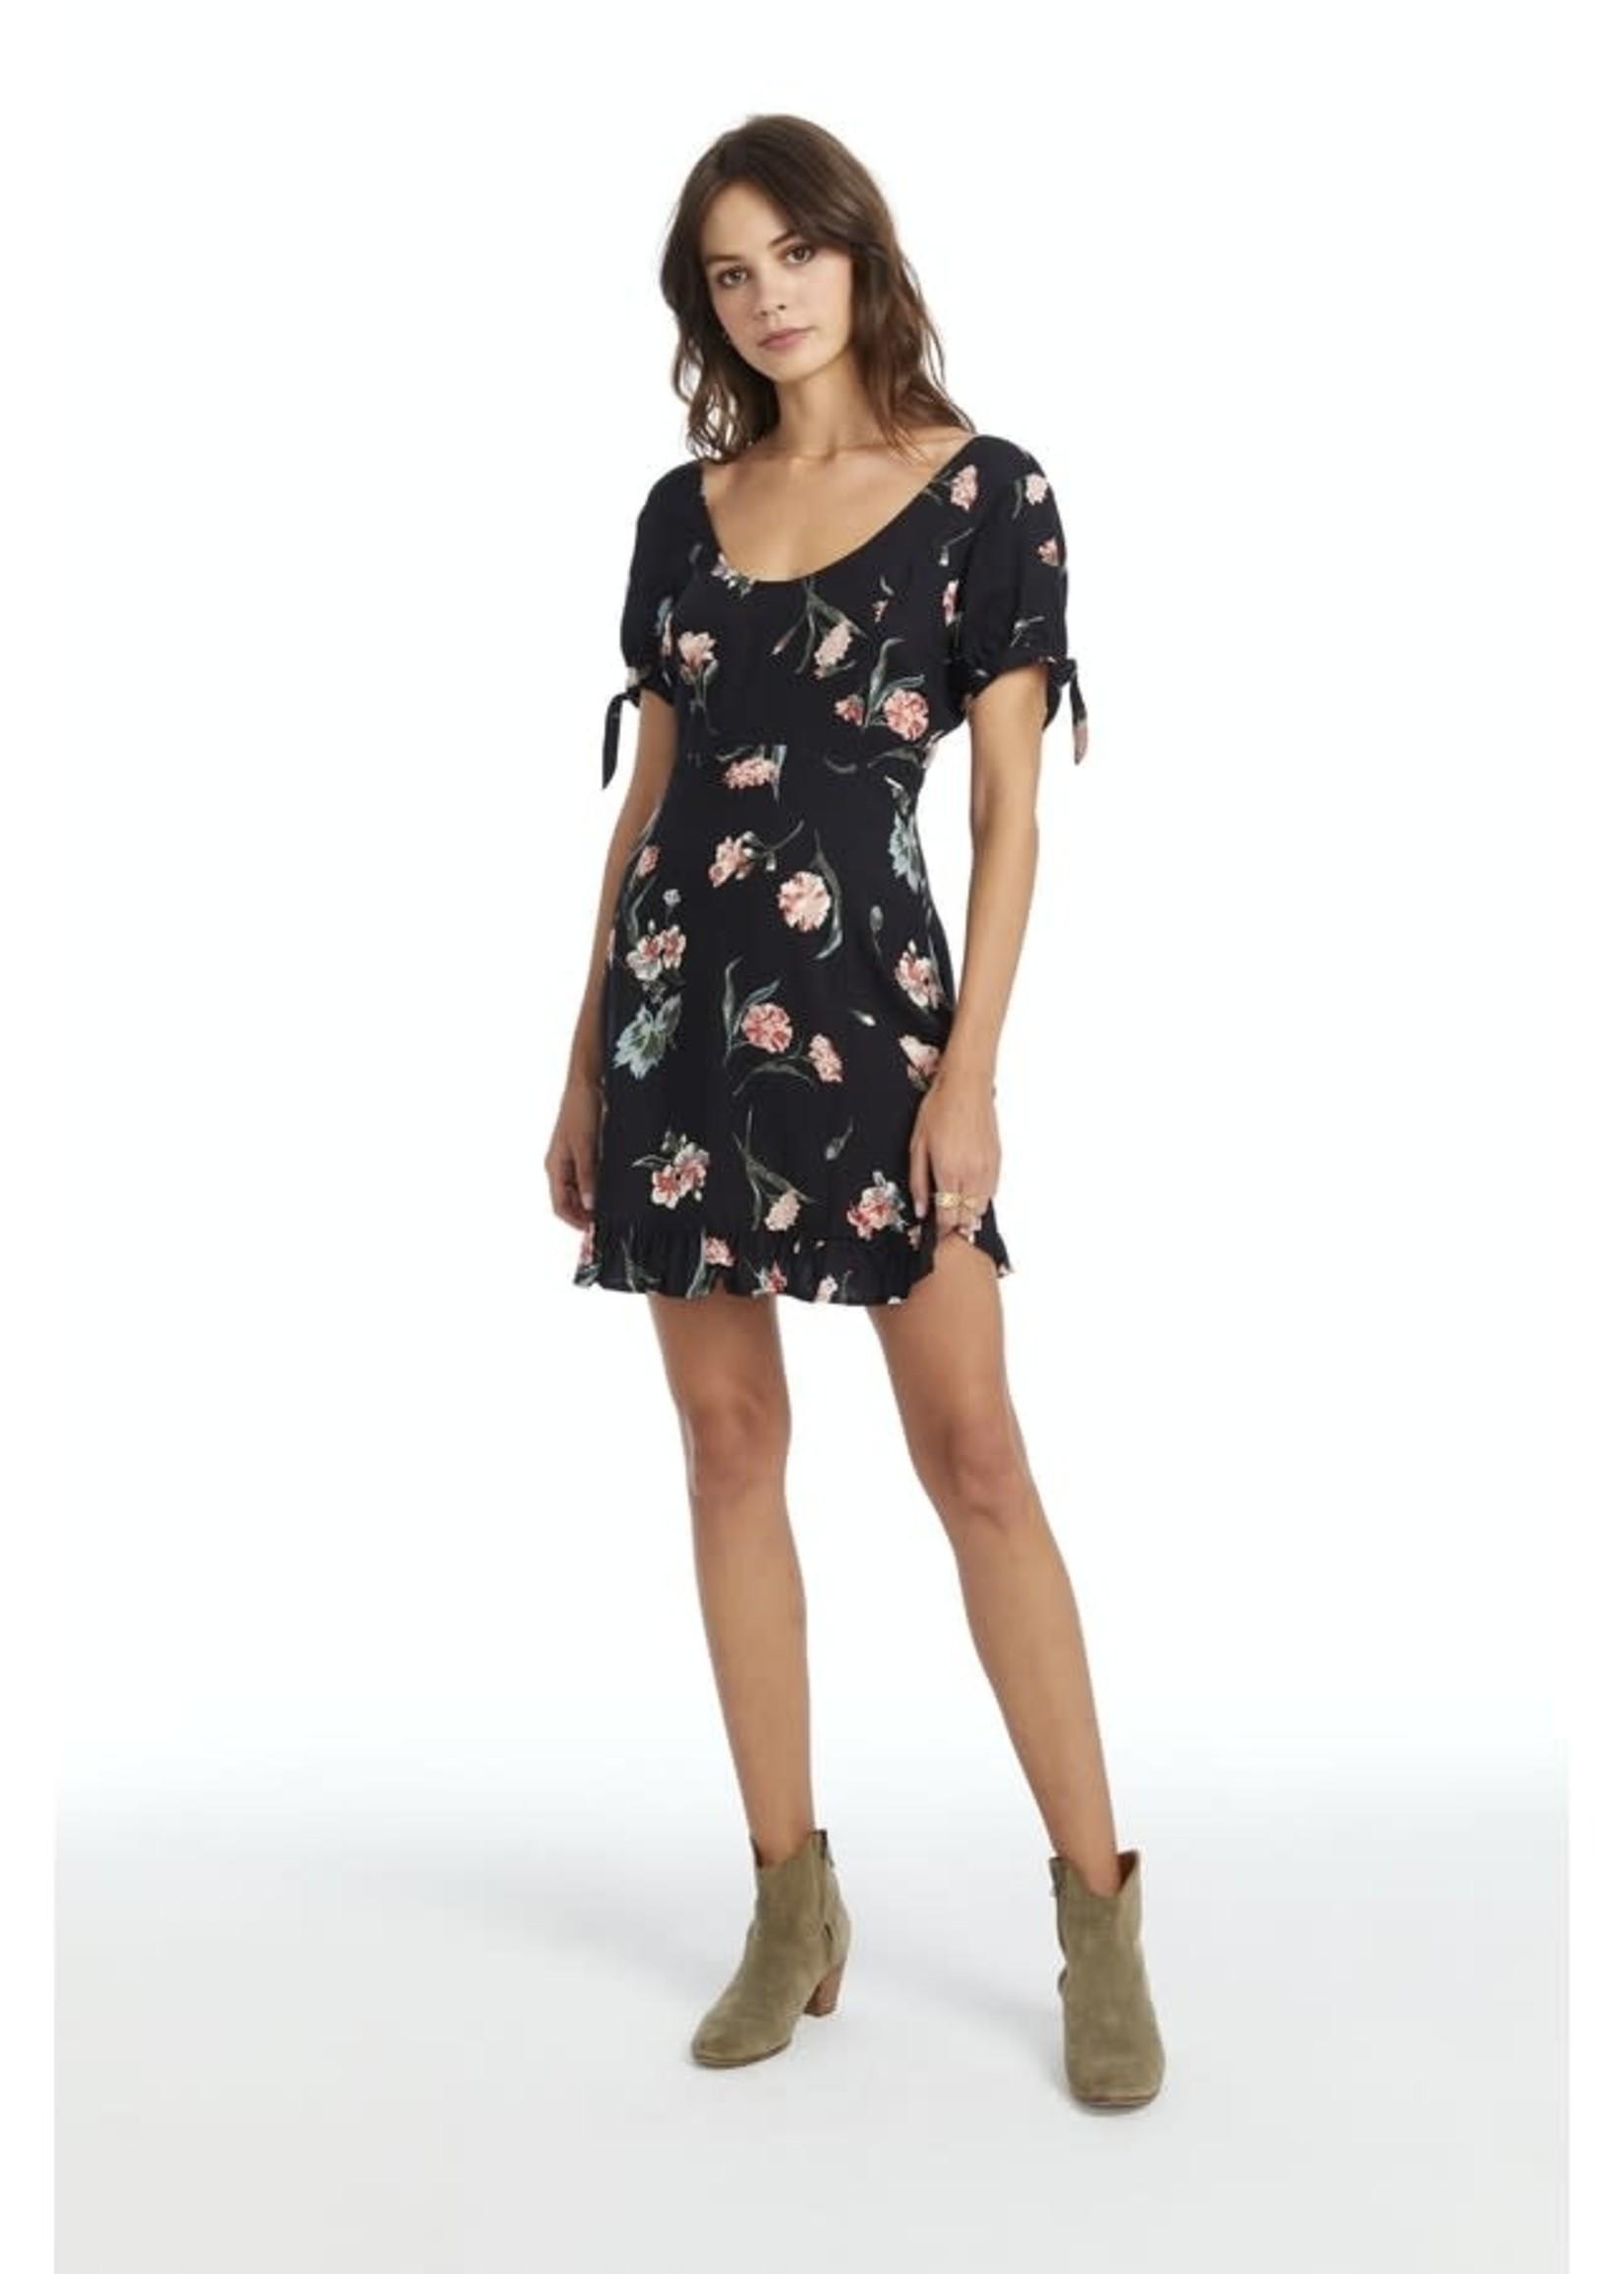 SALTWATER LUXE SOPHIE dress